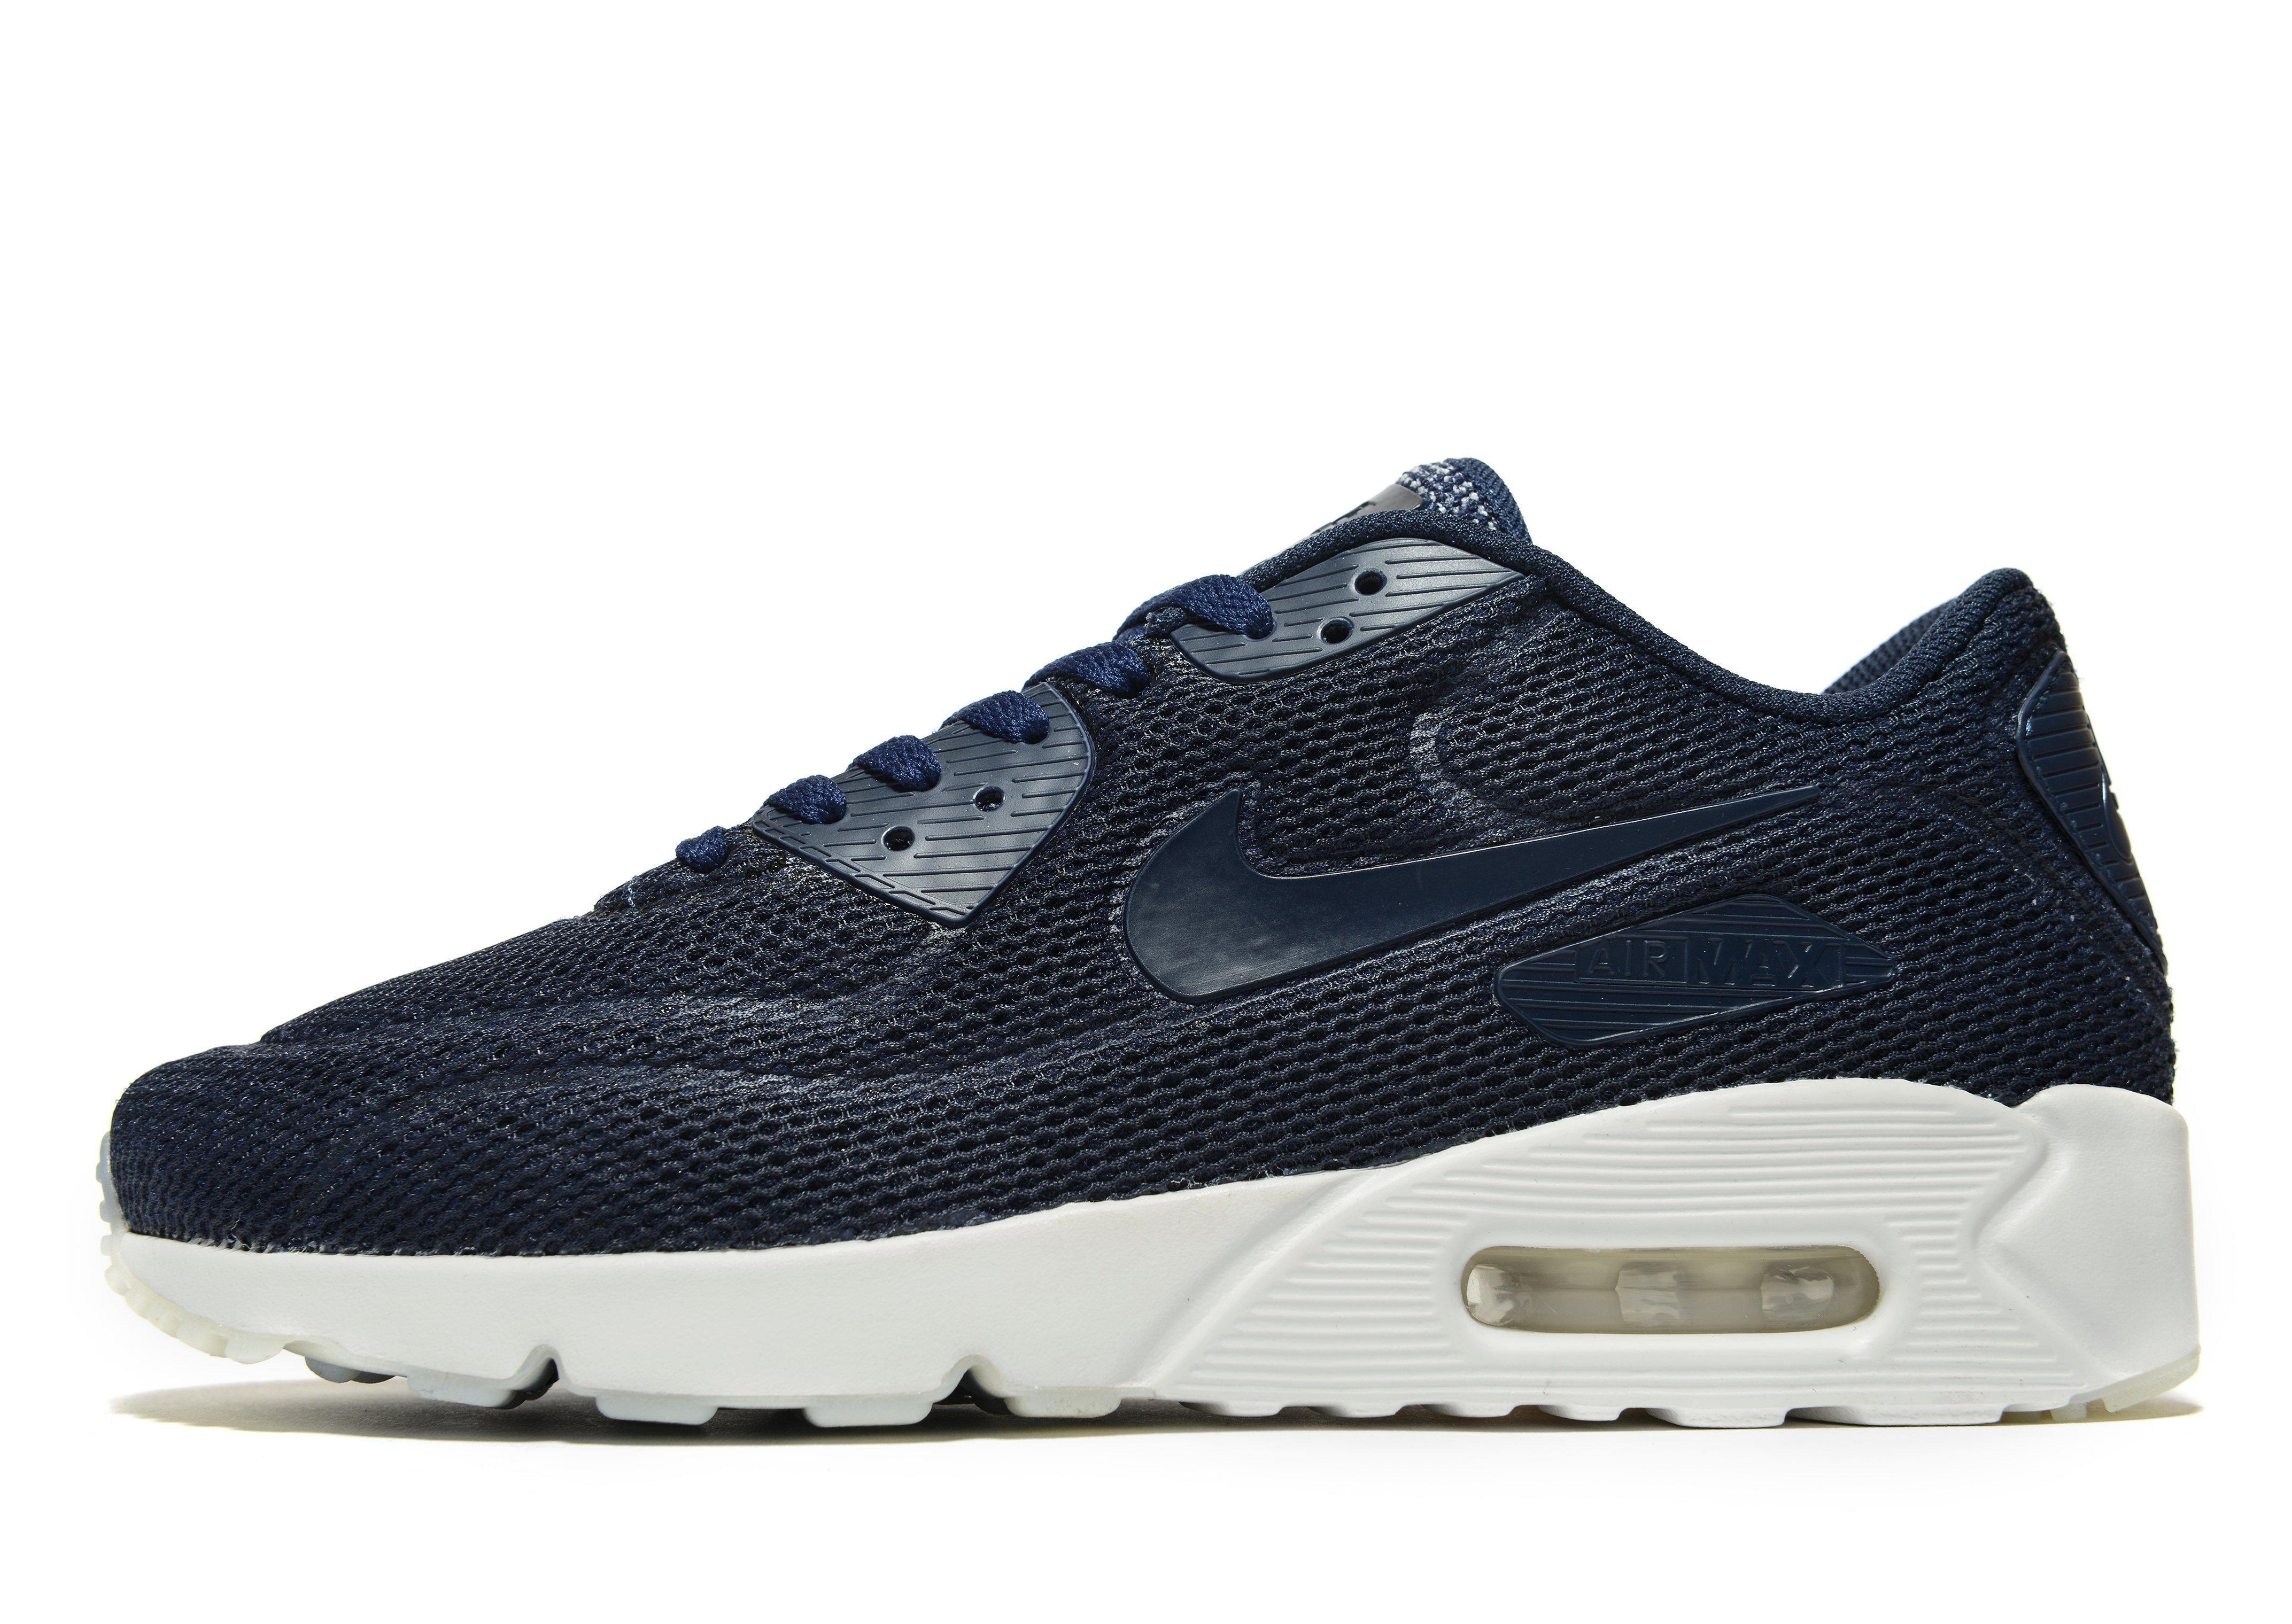 29759245ffc5 Nike Air Max 90 Ultra 2.0 Breathe in Blue for Men - Lyst